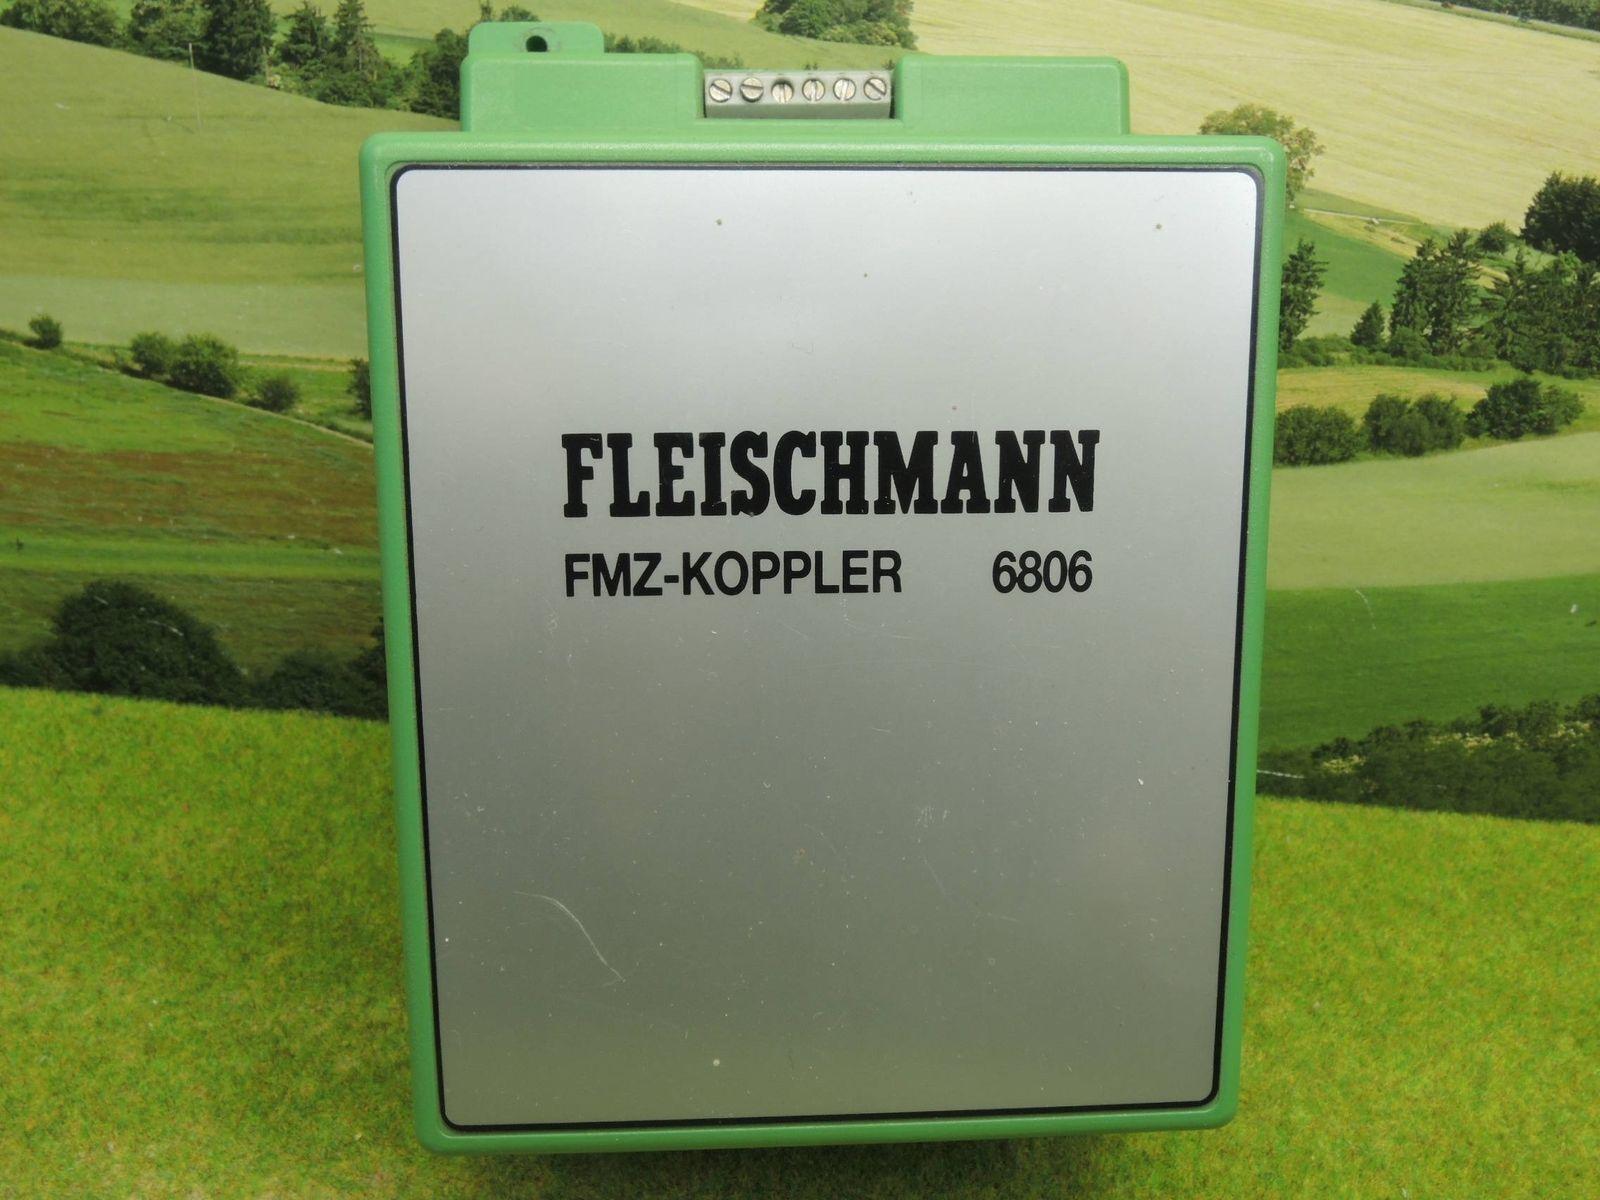 1-6806 FMZ-FLEISCHMANN KOPPLER COUPLEUR x FMZ USATO COME da FOTO